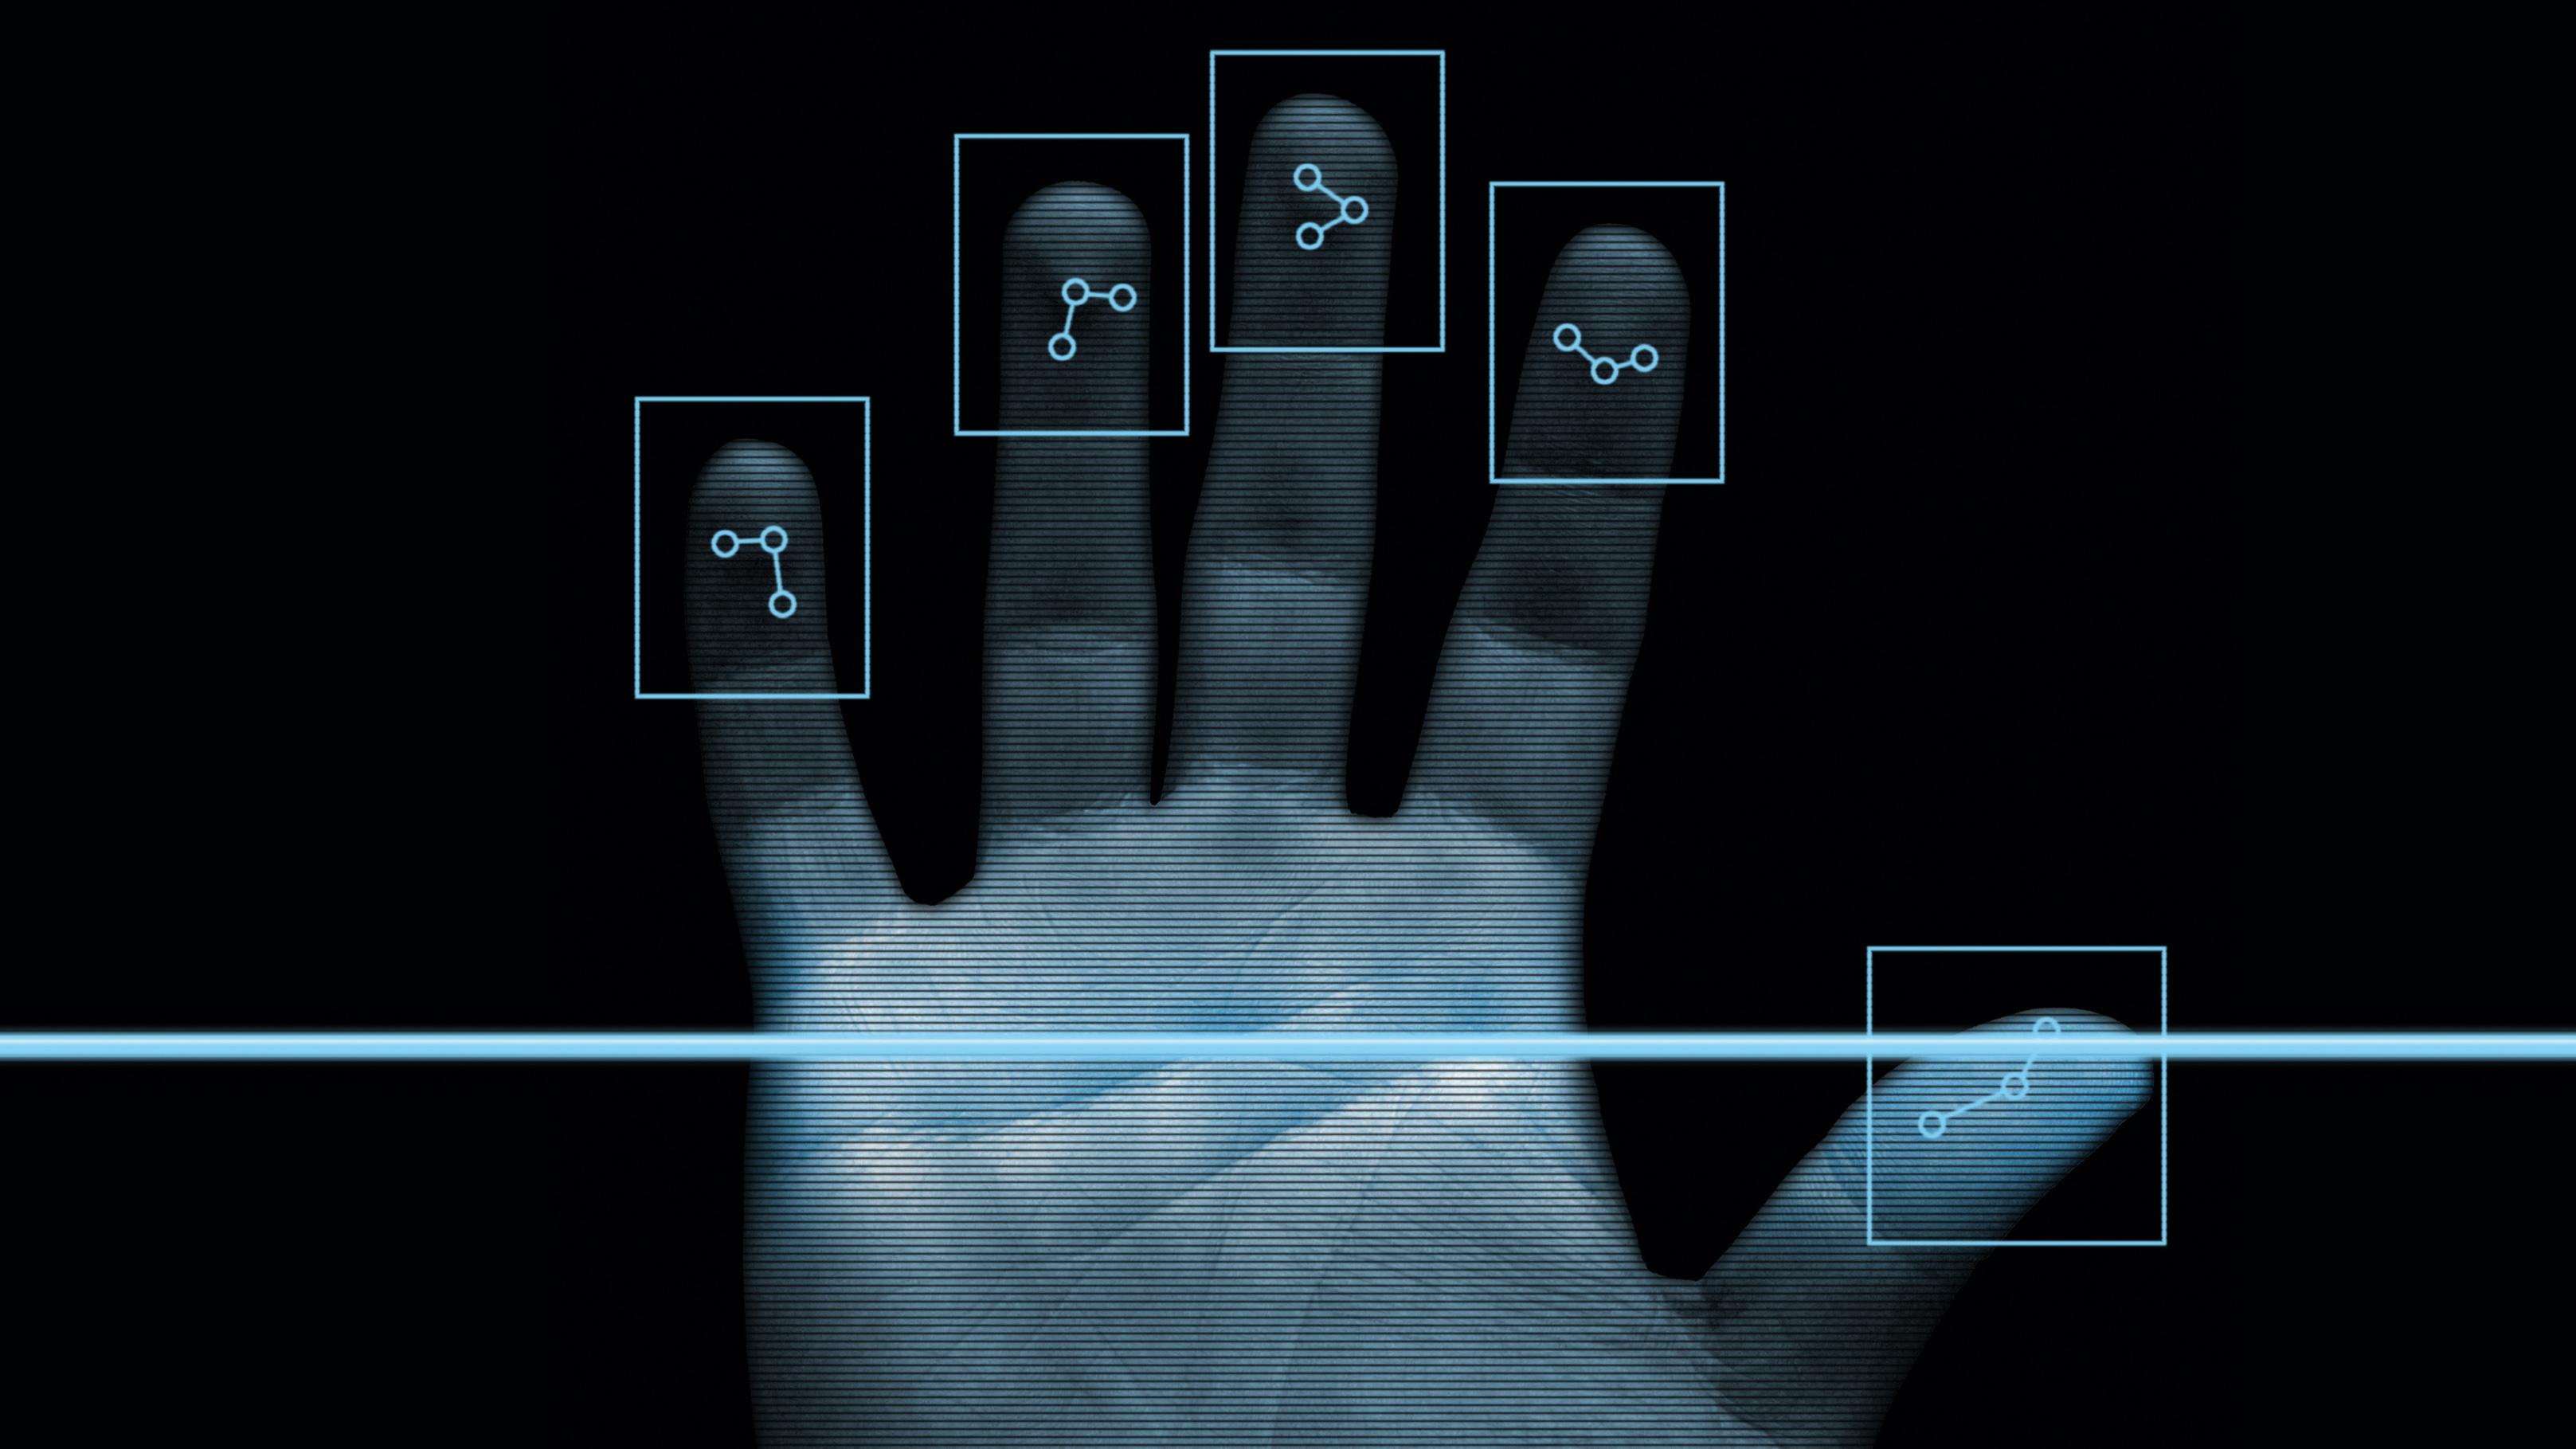 Are biometrics the future for mobile authentication? | TechRadar